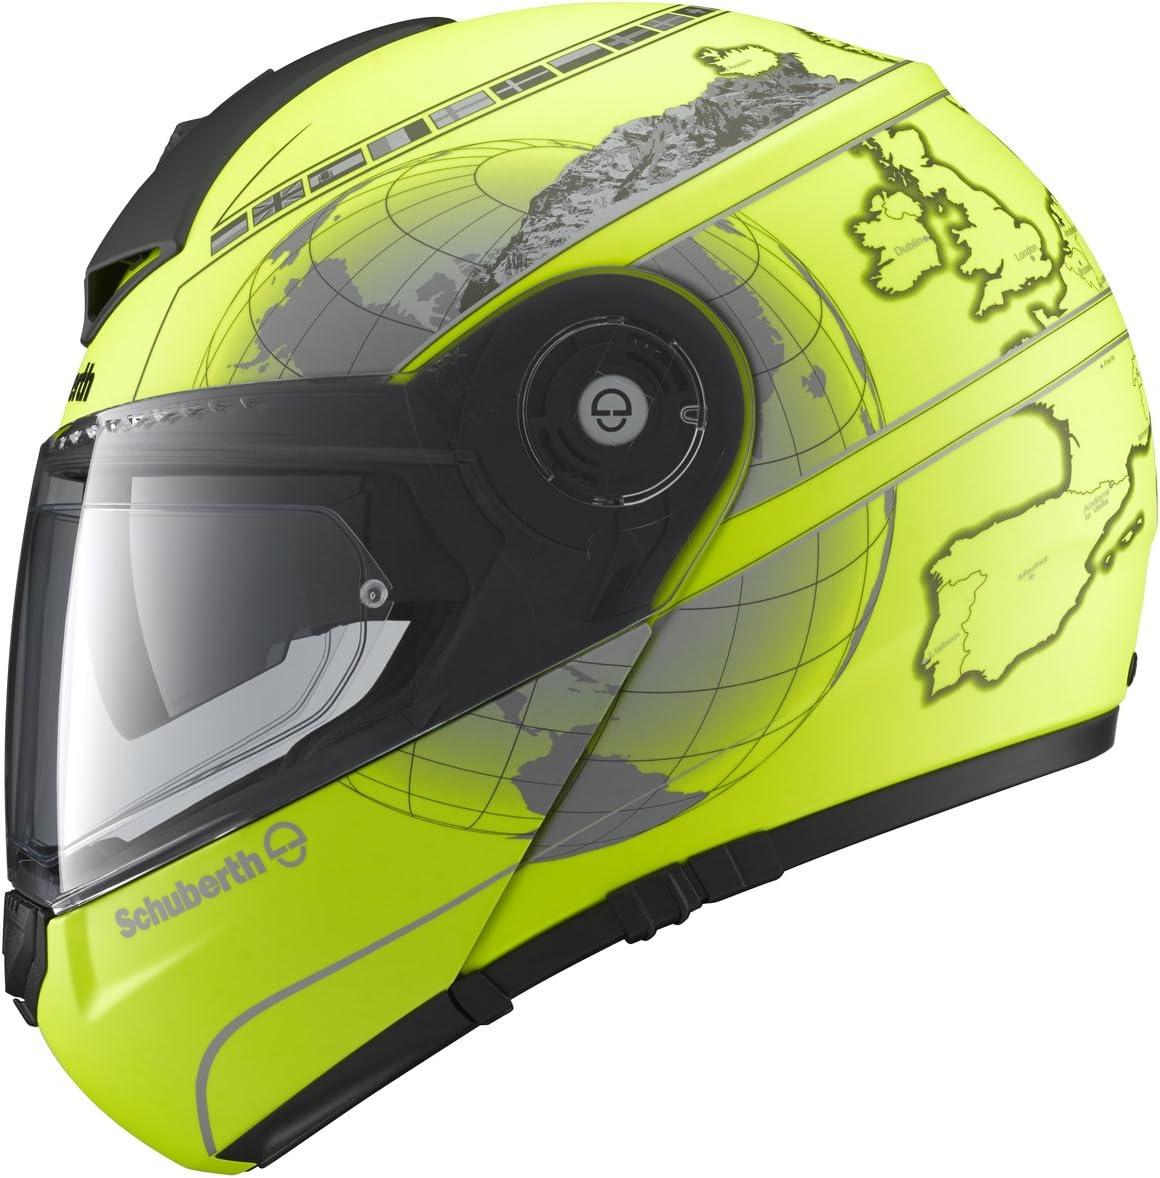 Mejor casco Schuberth modular